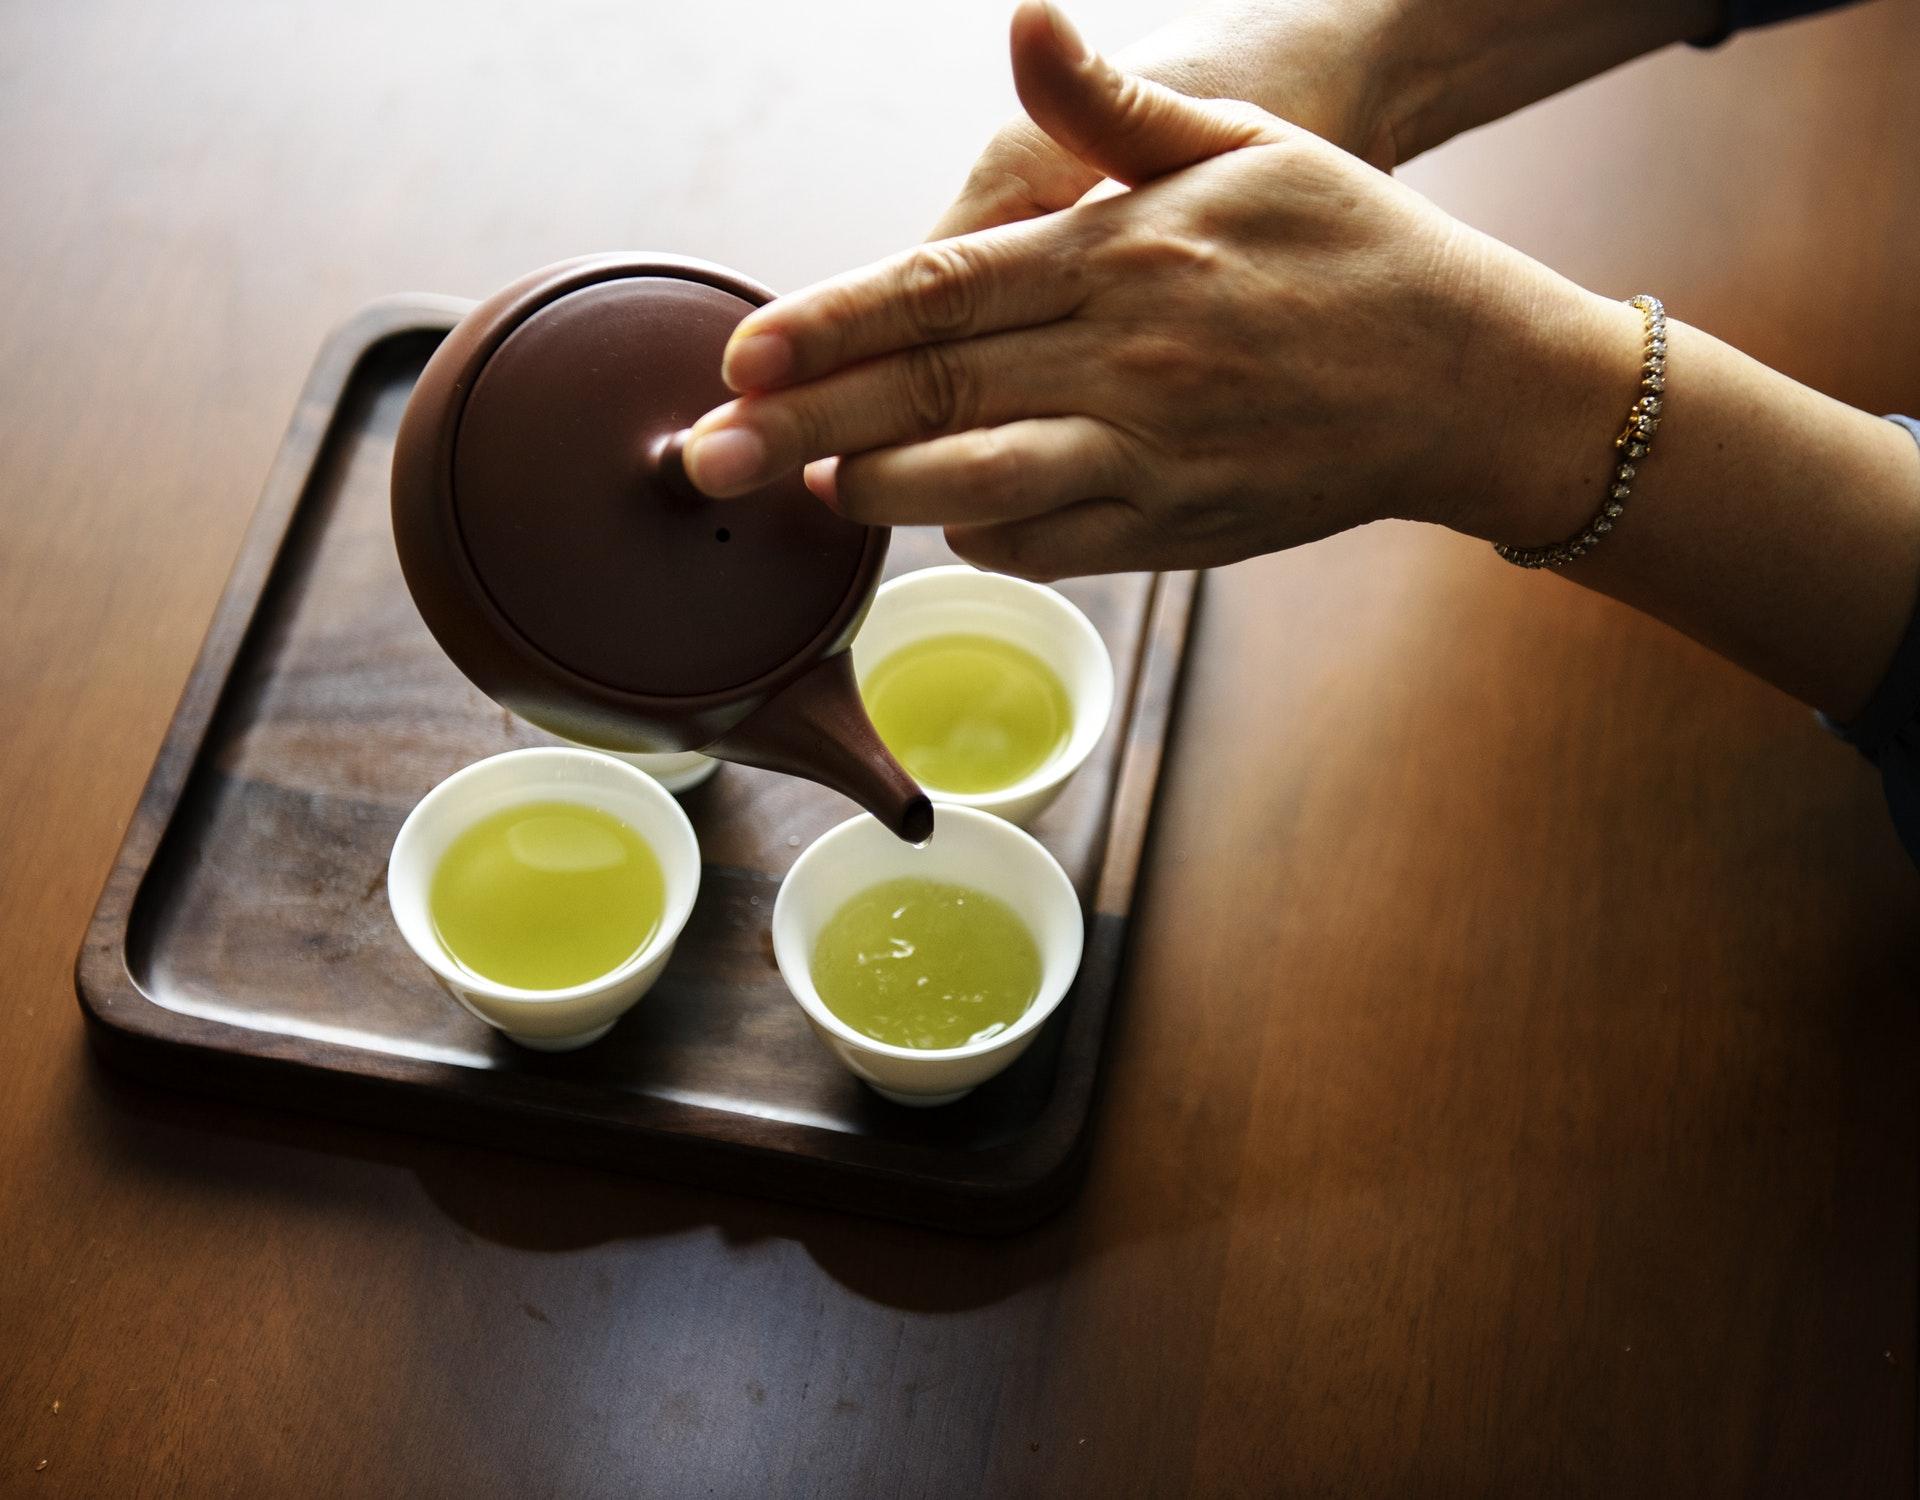 tè verde asiatico, teiera e tazzine